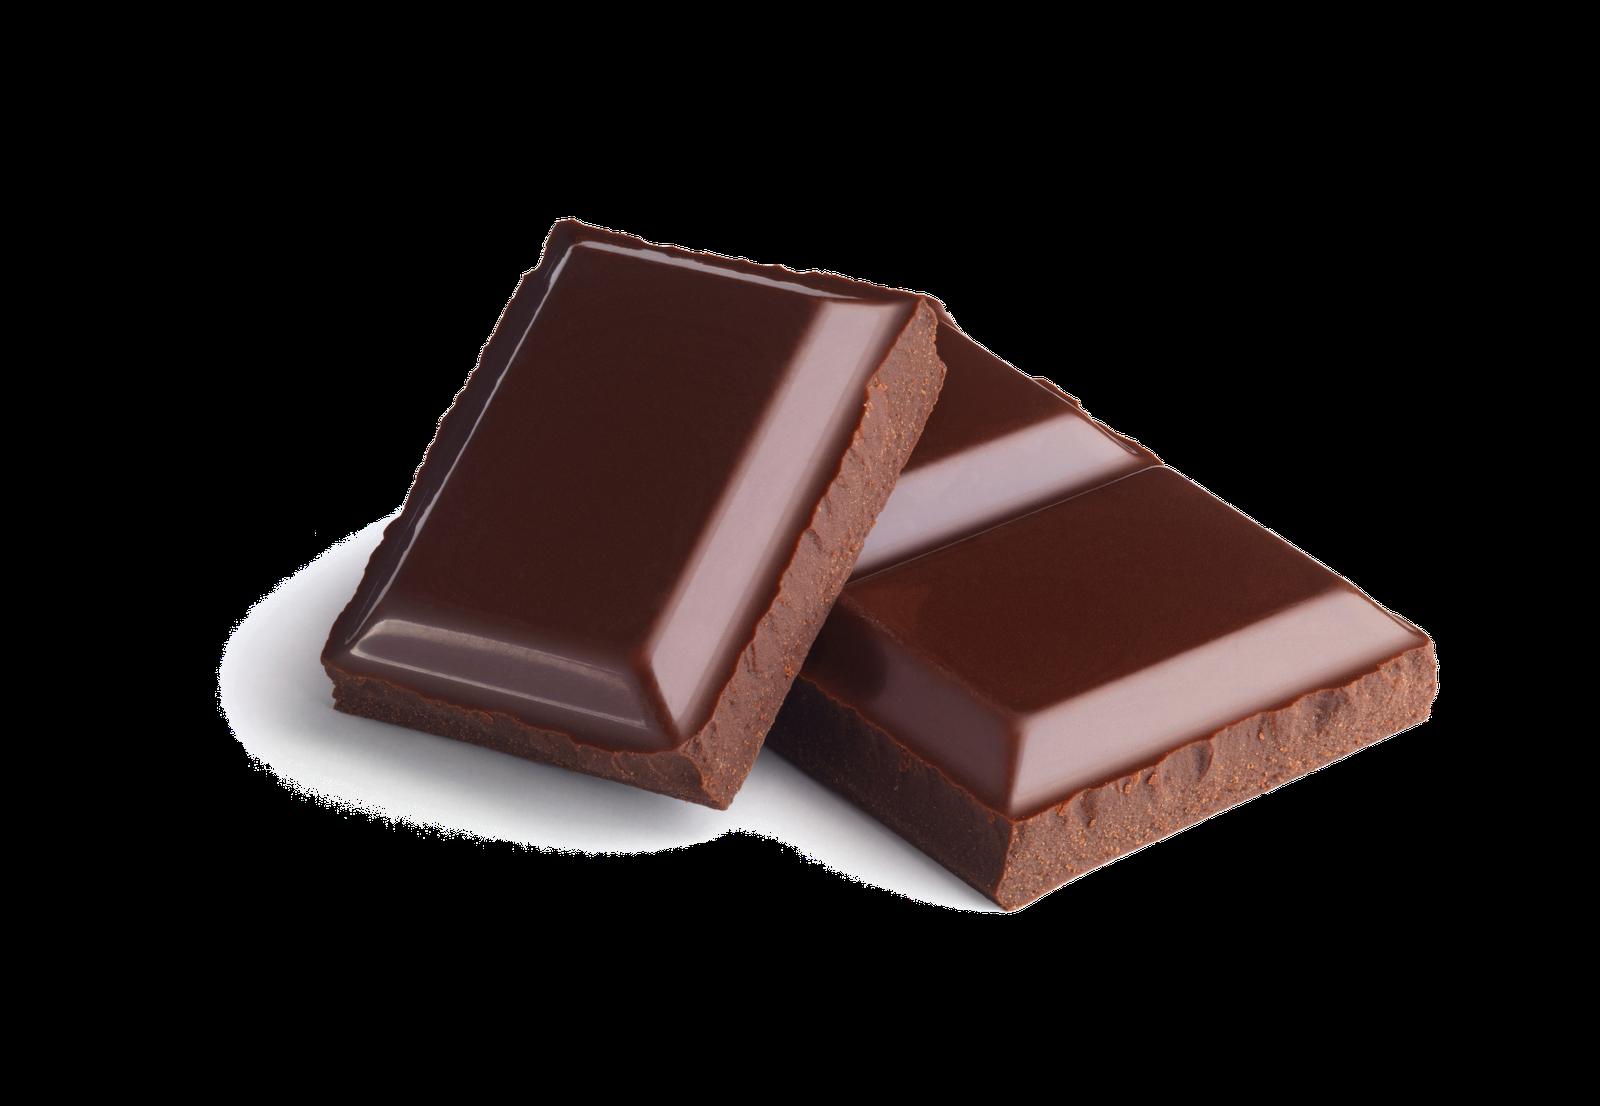 Chocolate PNG image - Chocolate PNG - Chocolate PNG HD